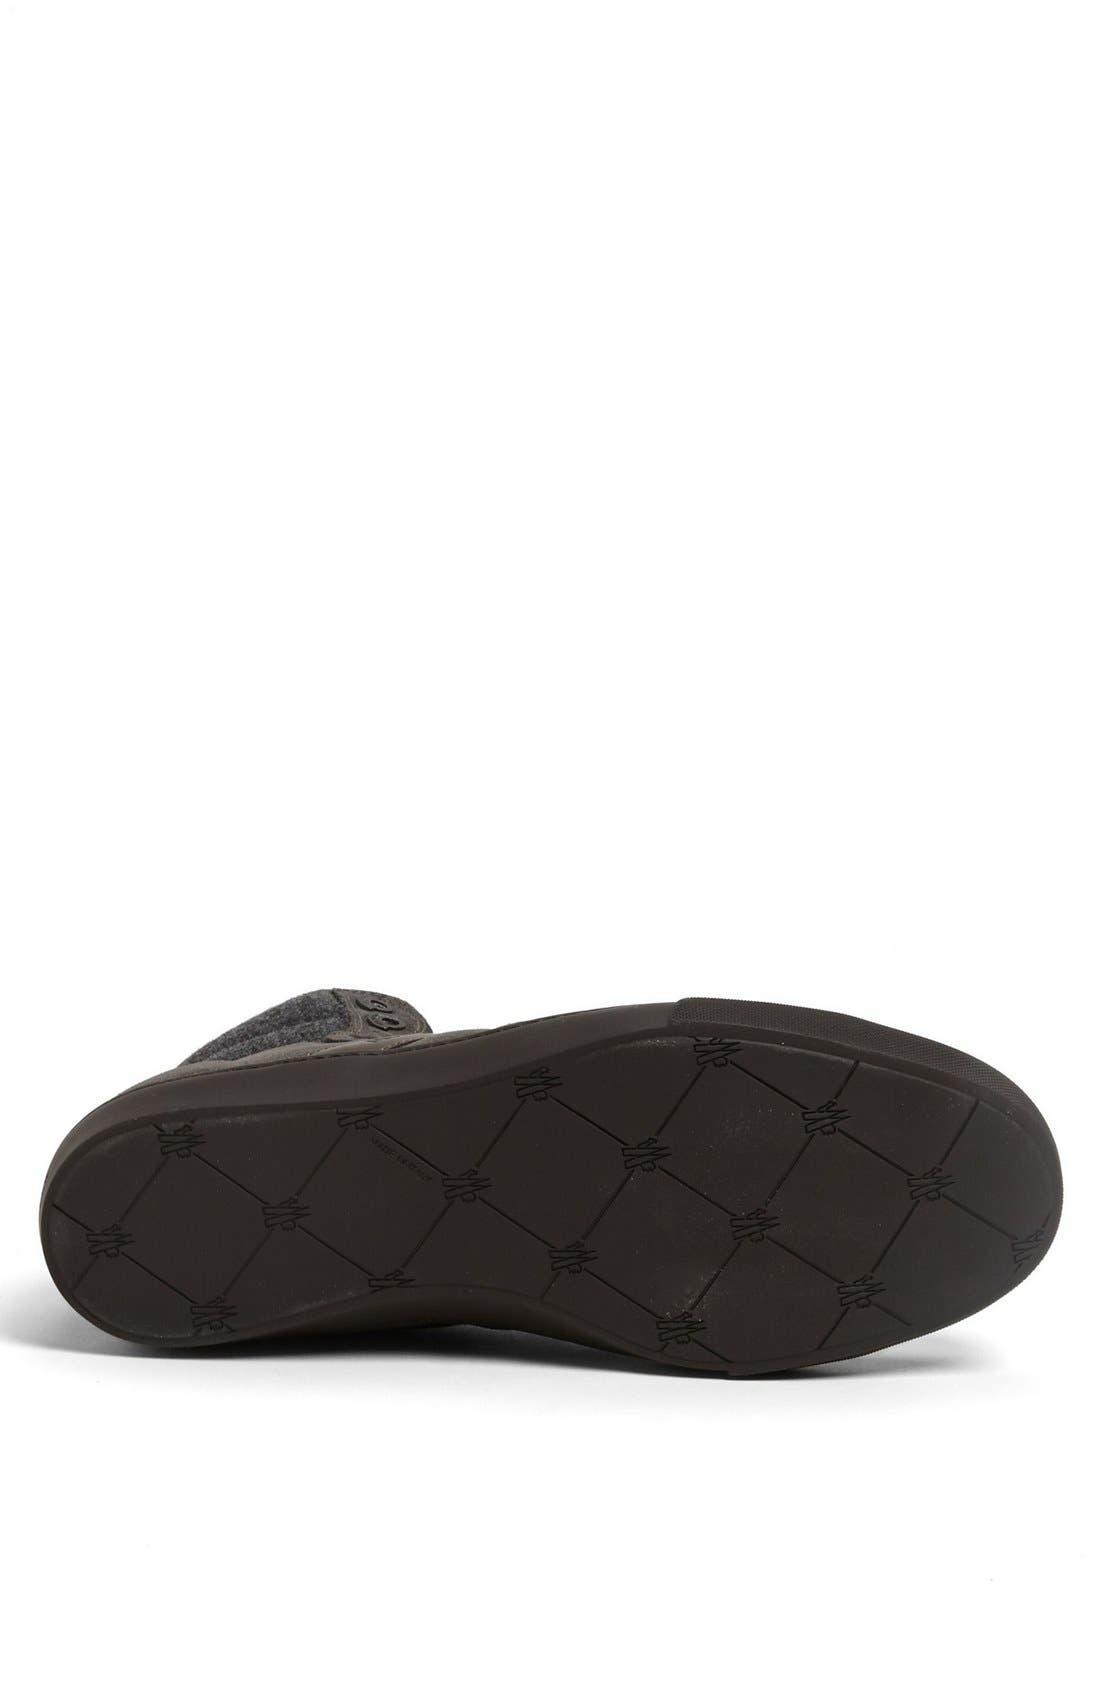 Alternate Image 4  - Moncler 'Lyon' Suede Sneaker